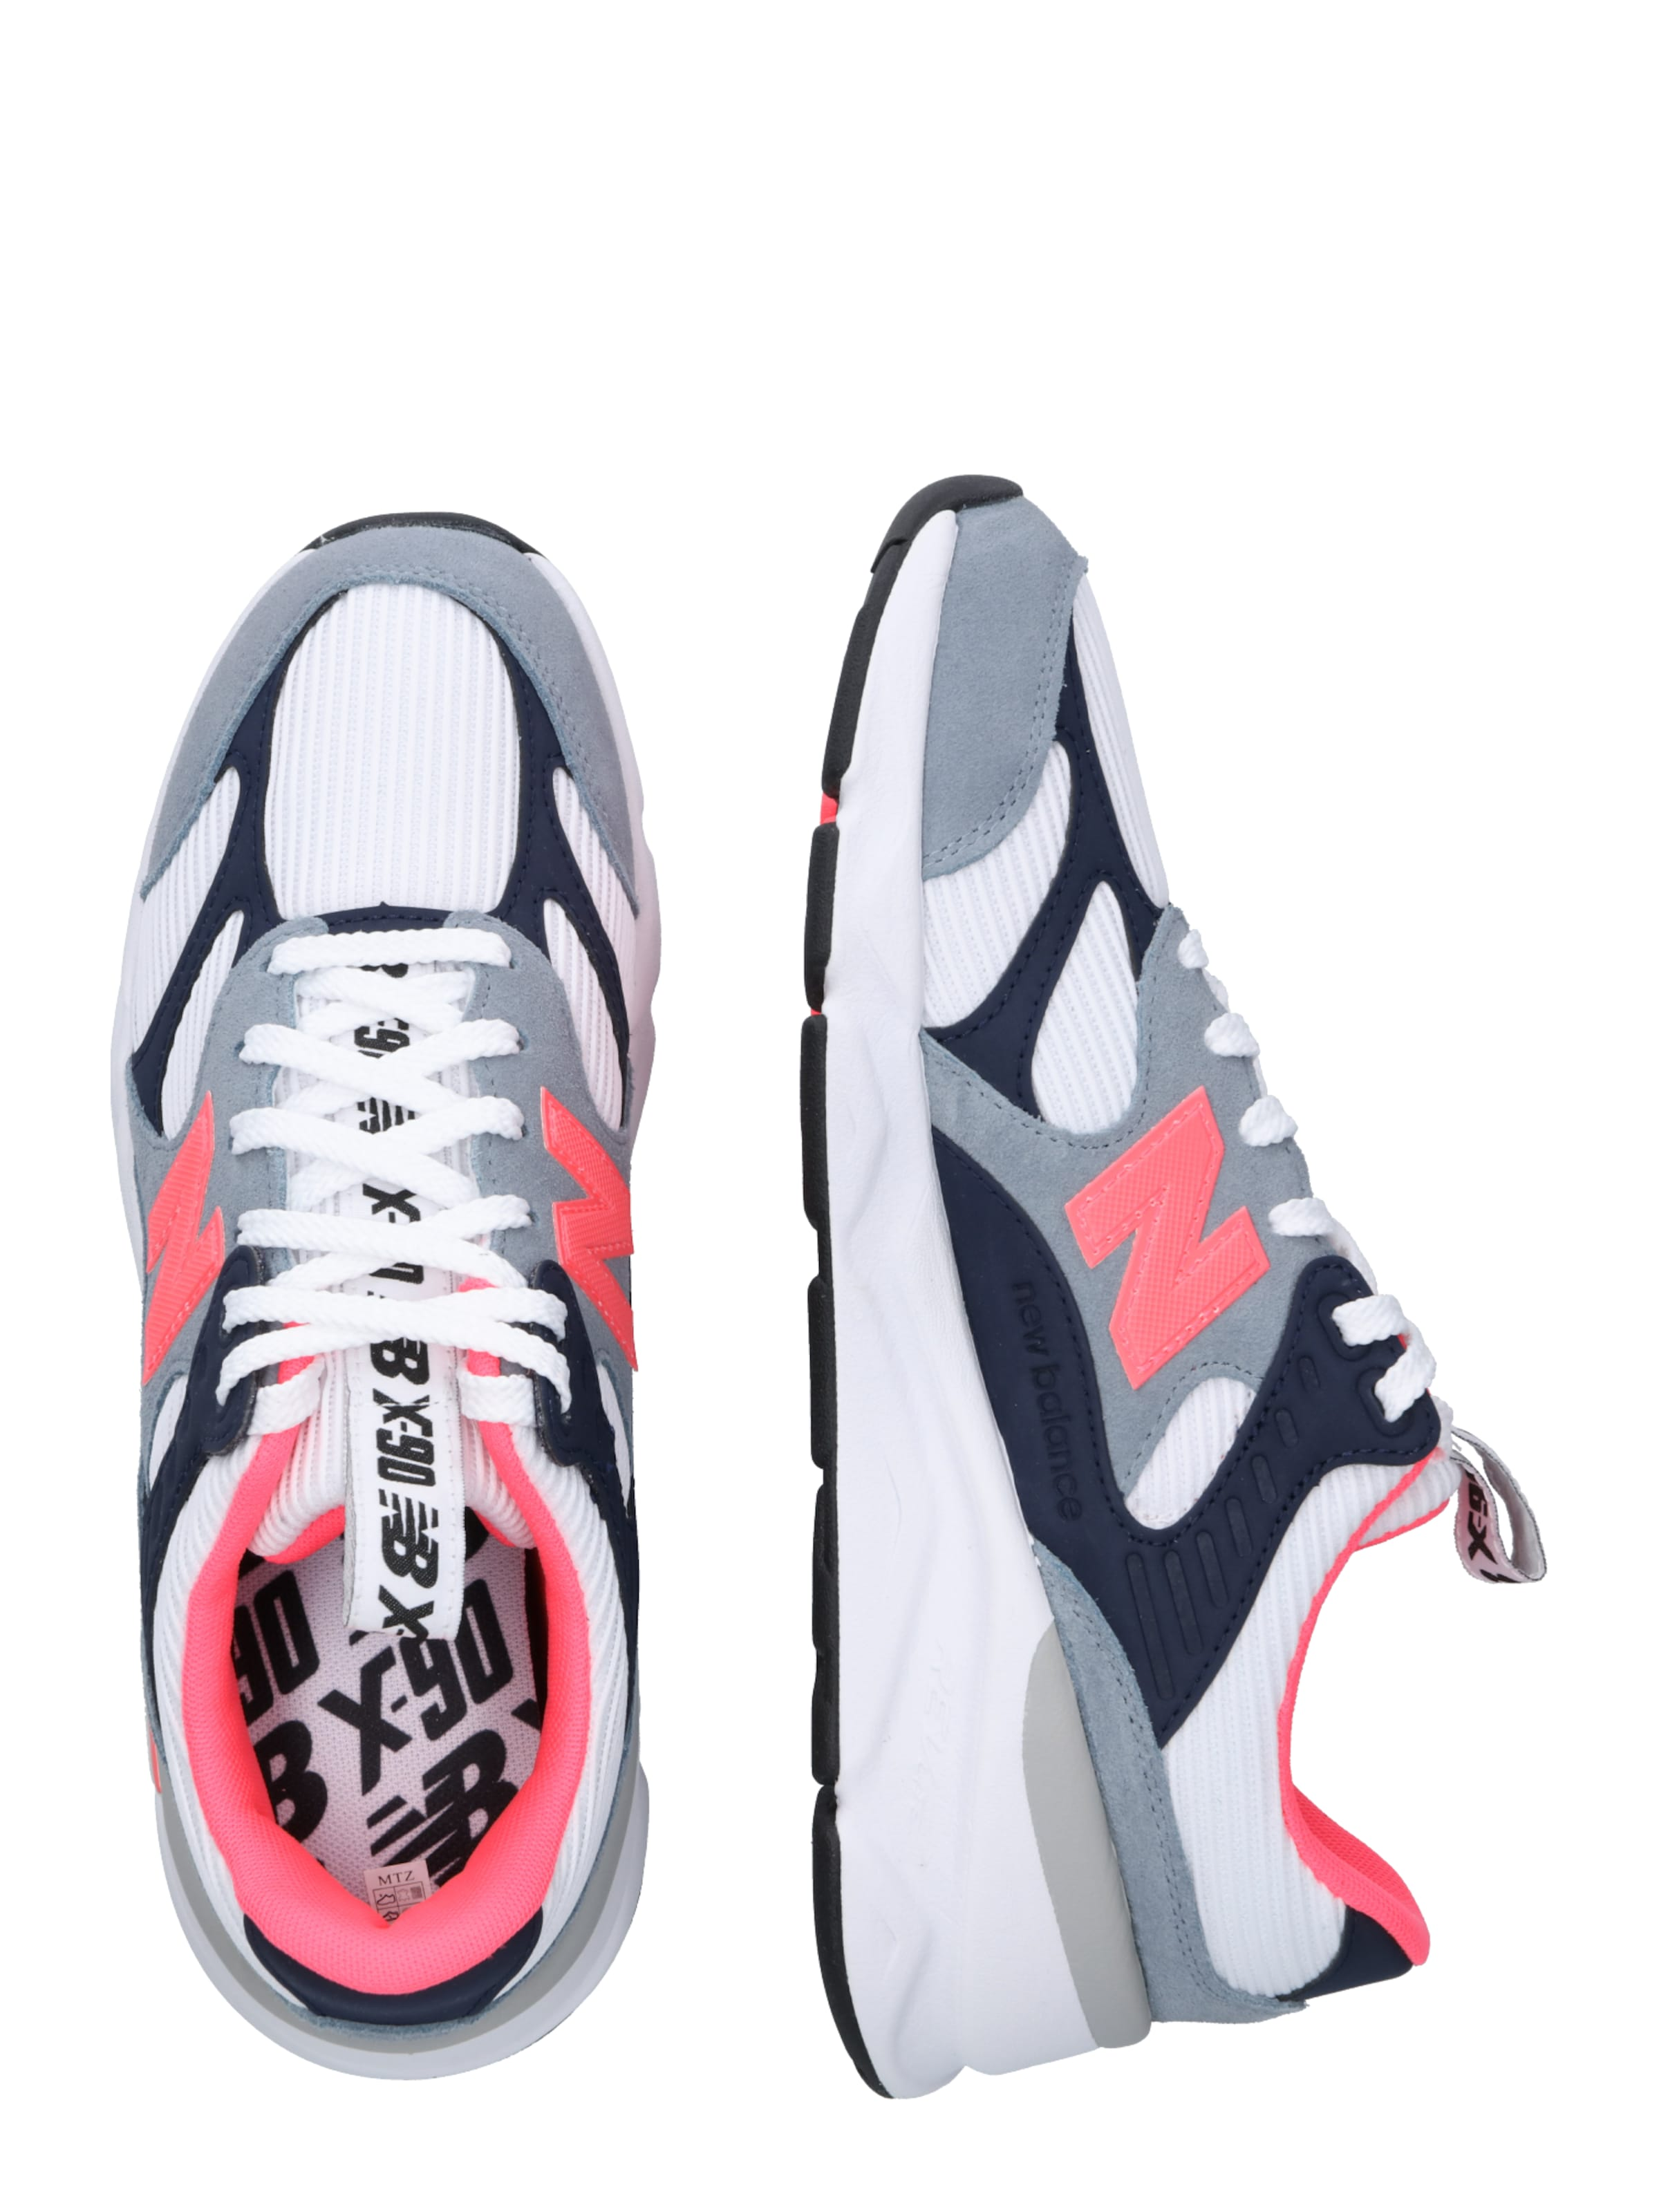 New In Sneaker 'msx90' Weiß GrauPink Balance NOPyn0w8vm